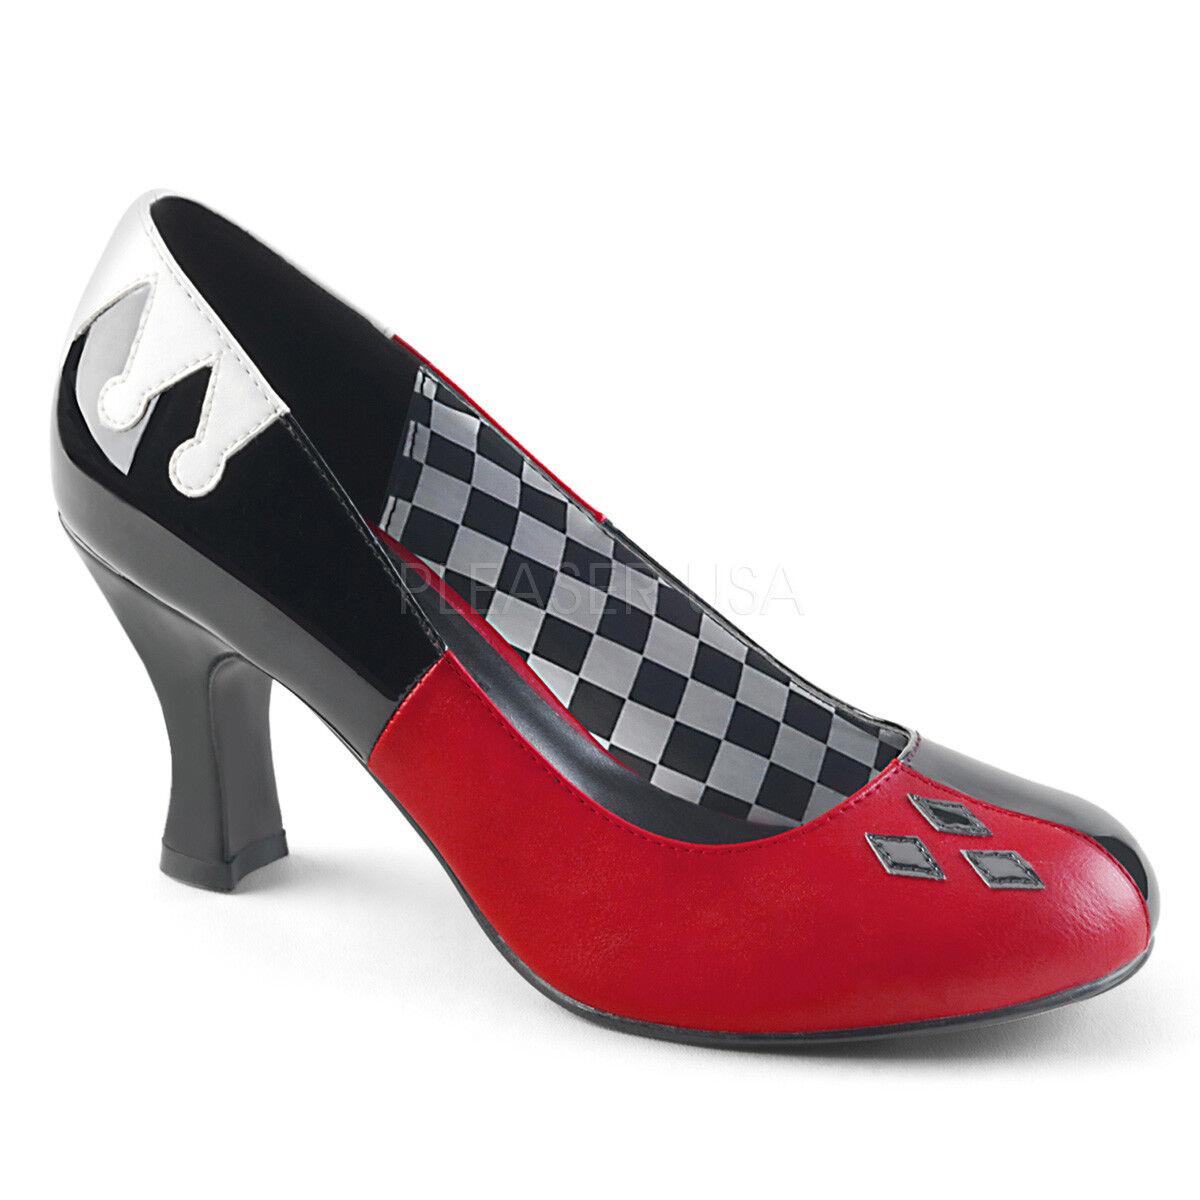 PLEASER Funtasma Harley - 42 rosso nero Jester Costume Harley Quinn Pompe